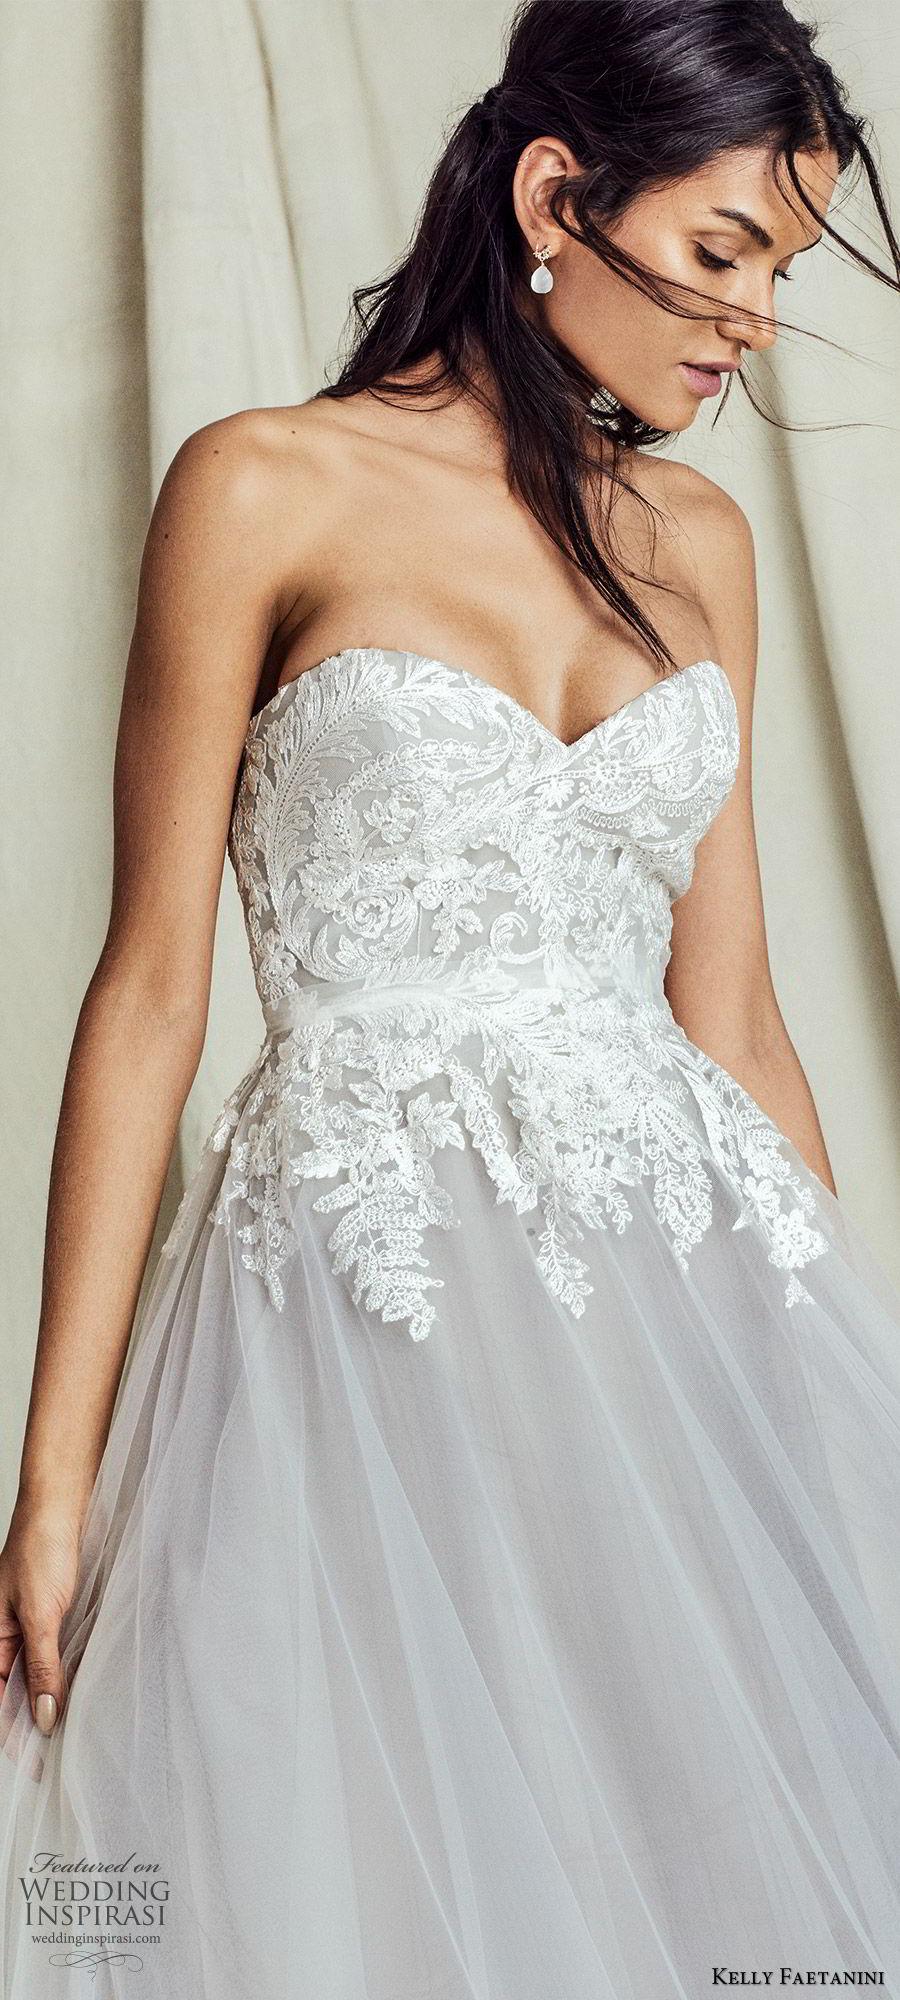 kelly faetanini fall 2019 bridal strapless sweetheart lace bodice a line ball gown wedding dress chapel train romantic elegant grey color (10) zv